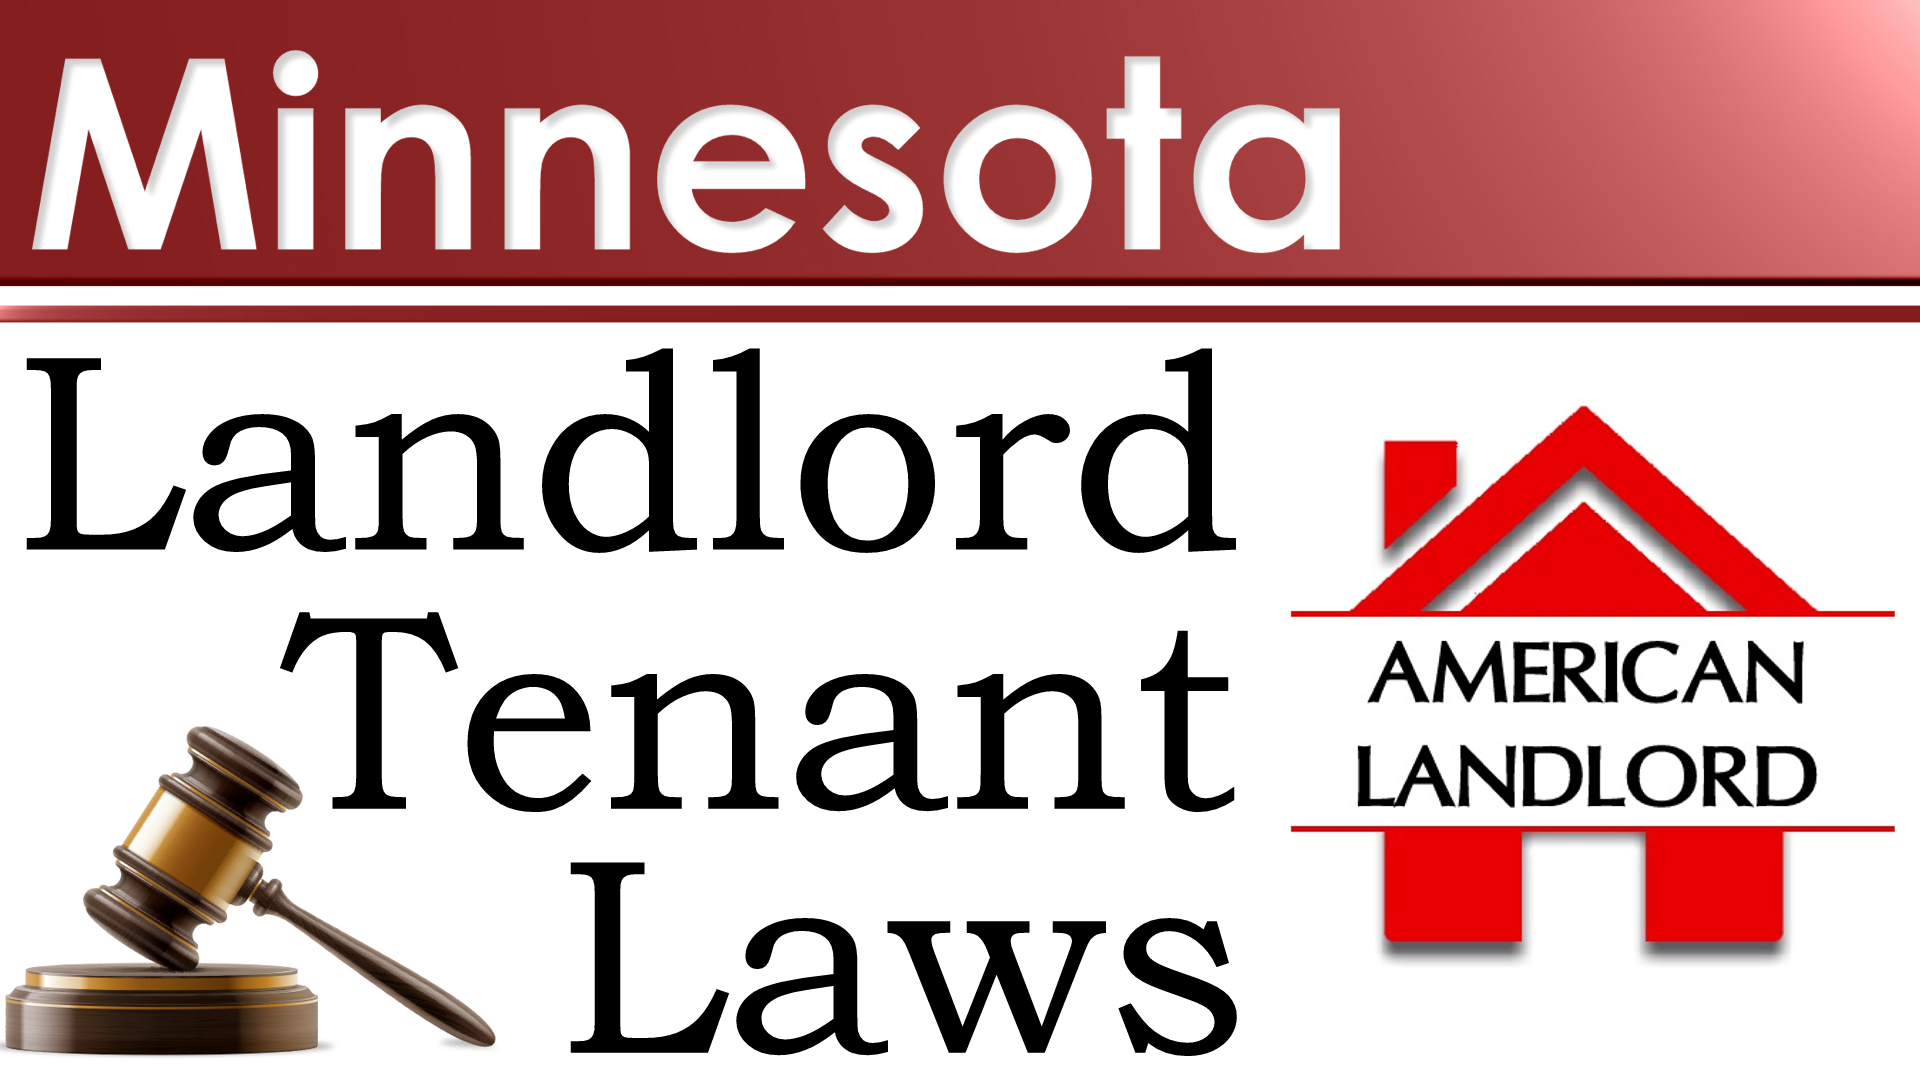 Minnesota landlord tenant law